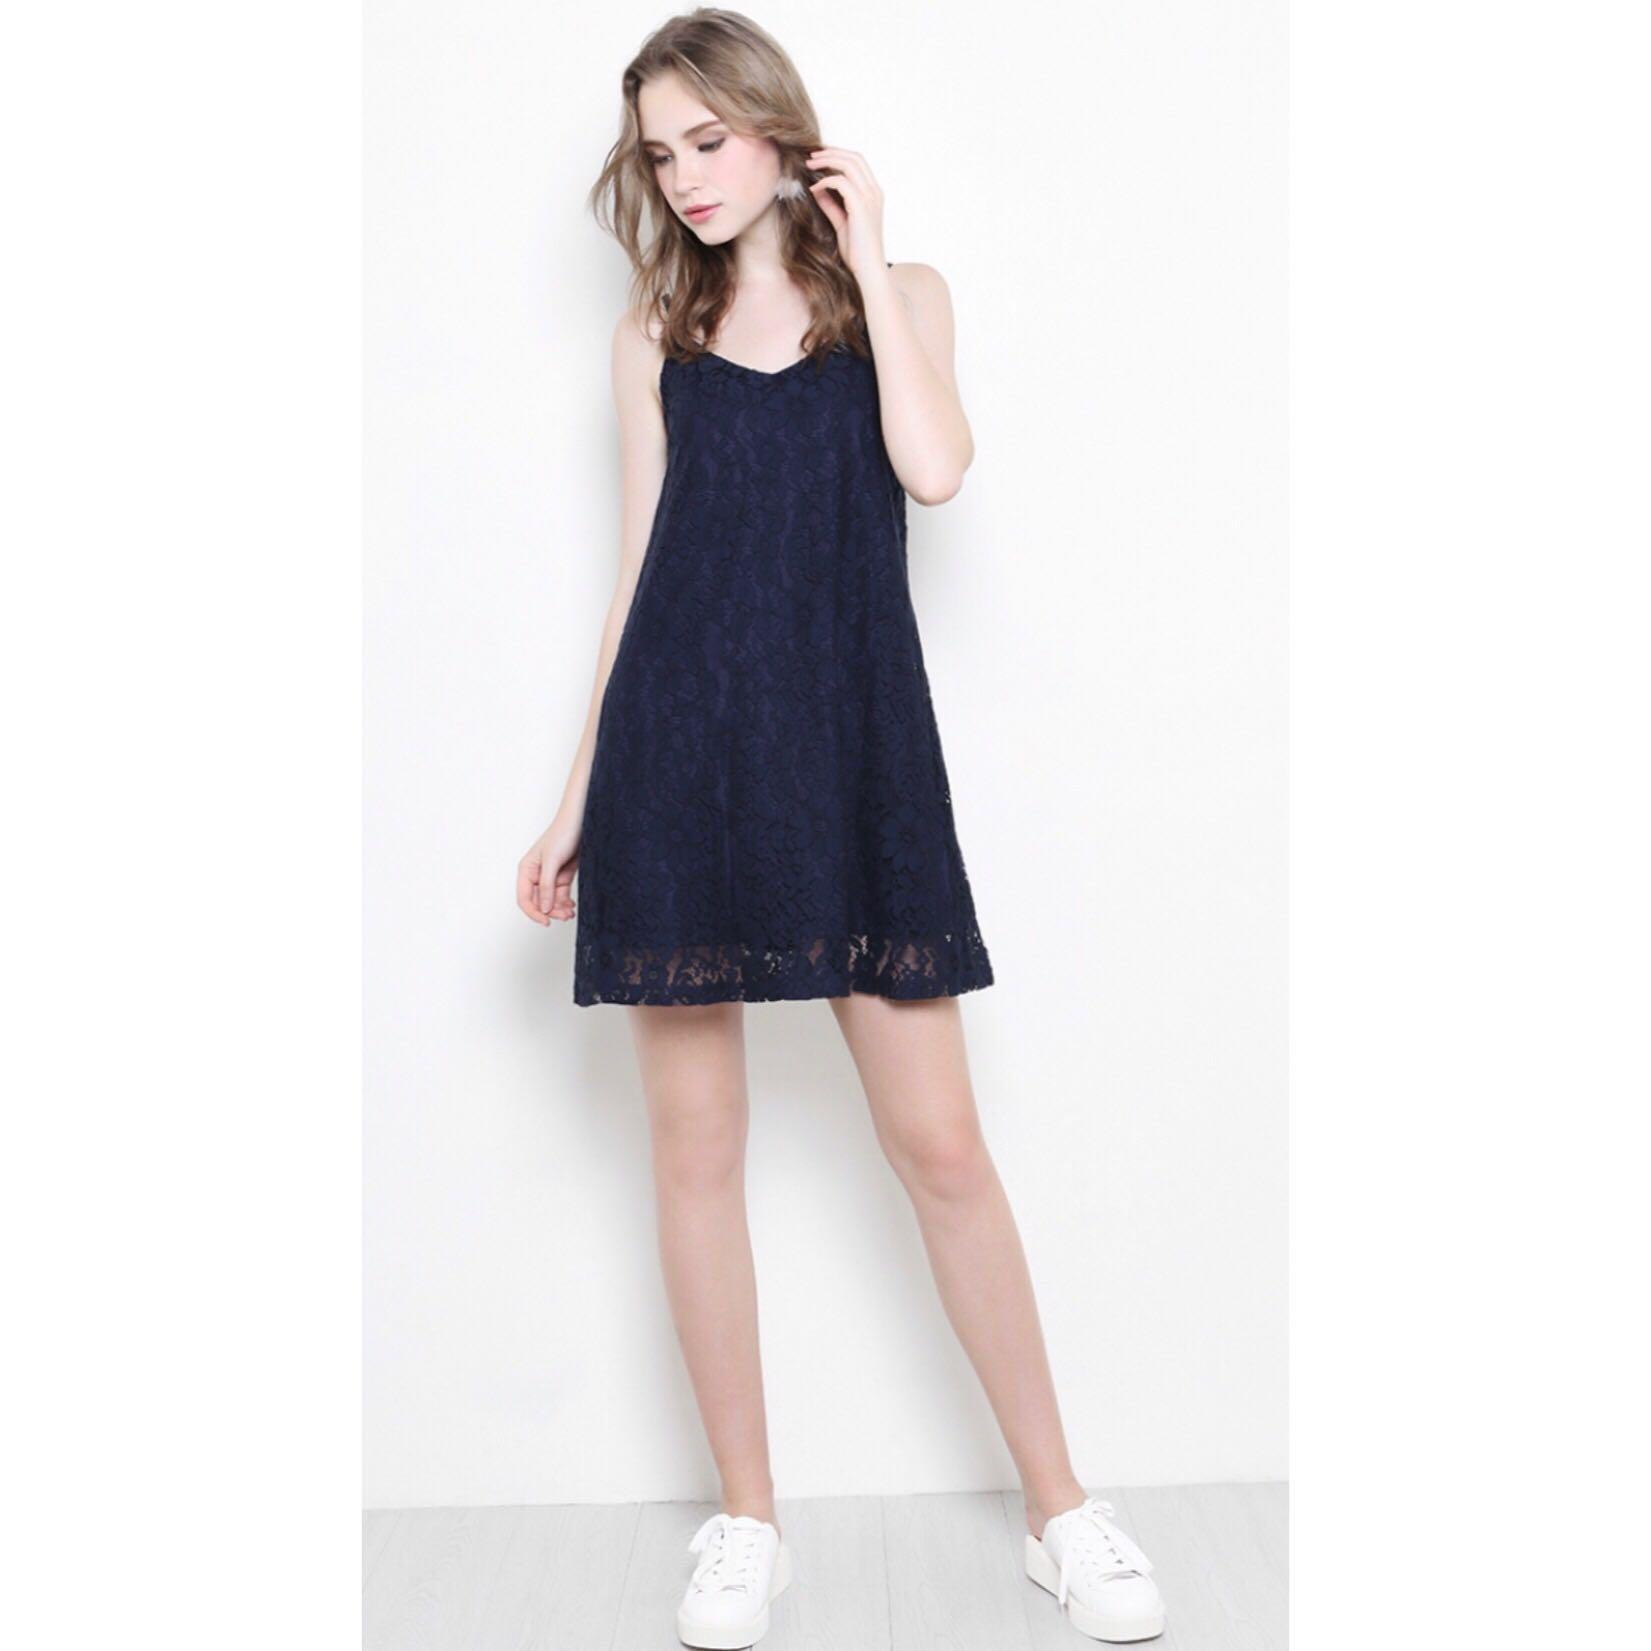 db3e9c5a967a SSD Shopsassydream Taryn Lace/Crochet Navy Cami Slip Dress, Women's ...